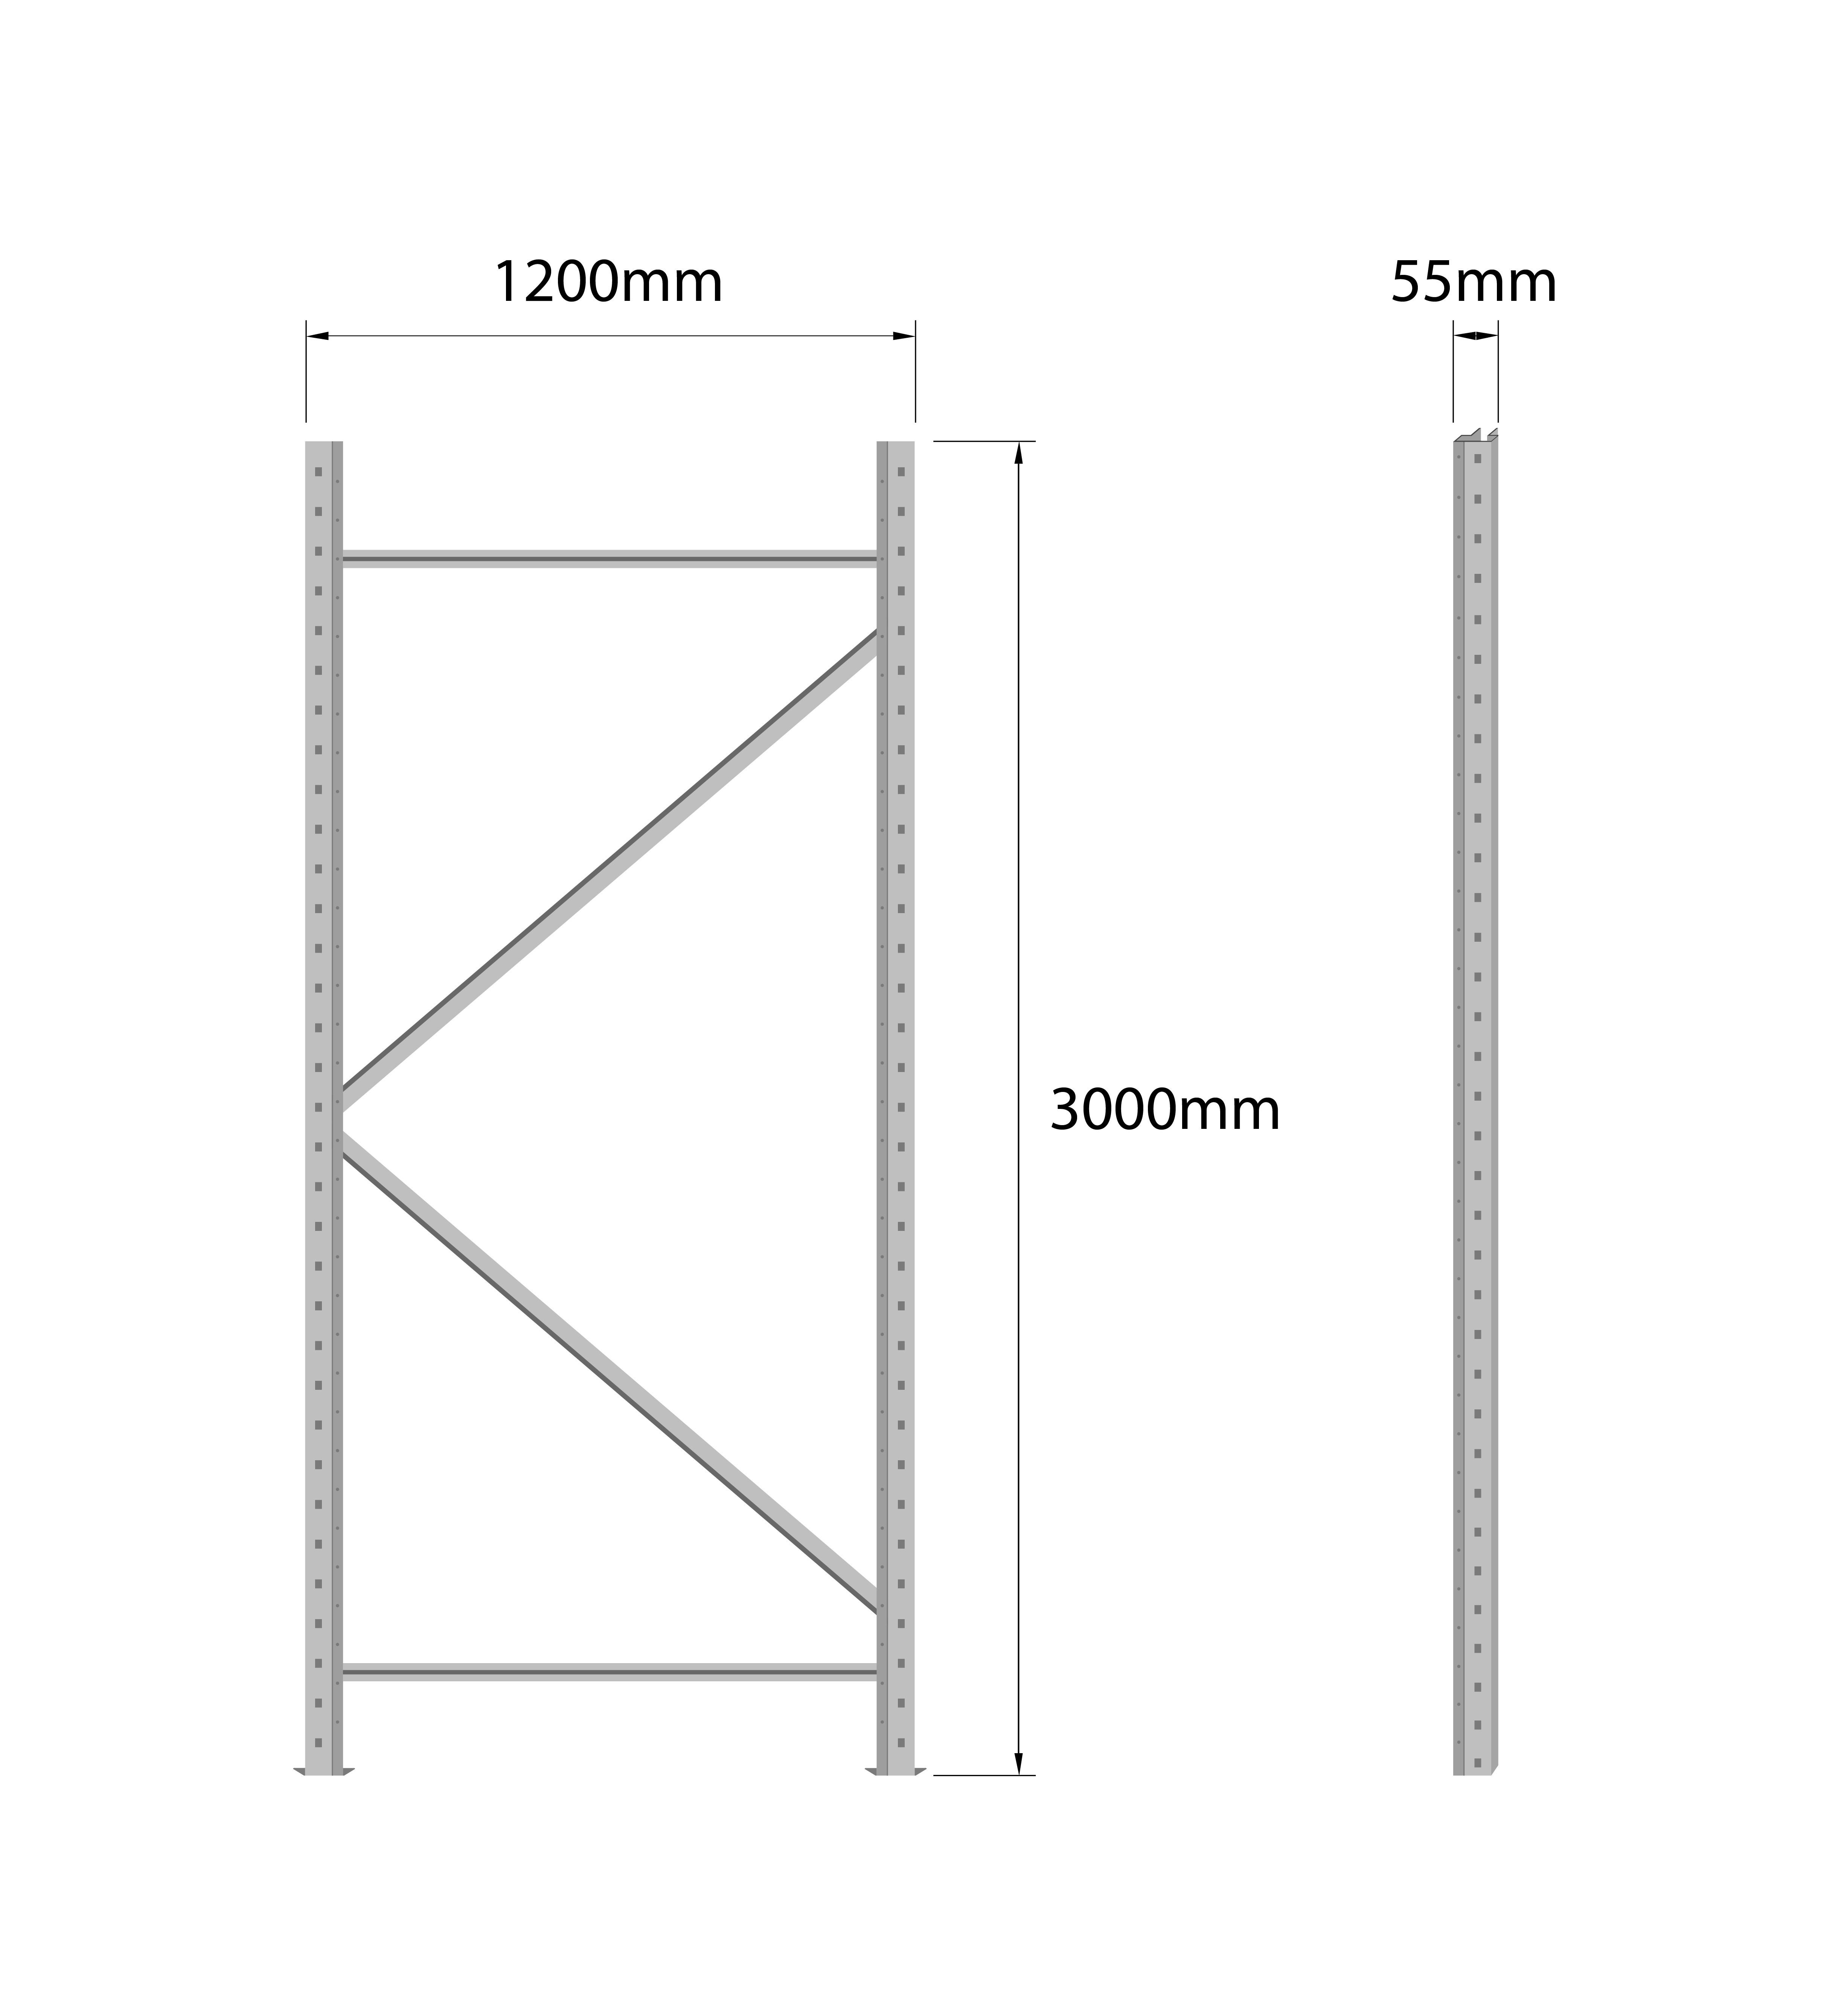 longspan - Uprights 3000mm_3000 x 1200 grey.jpg